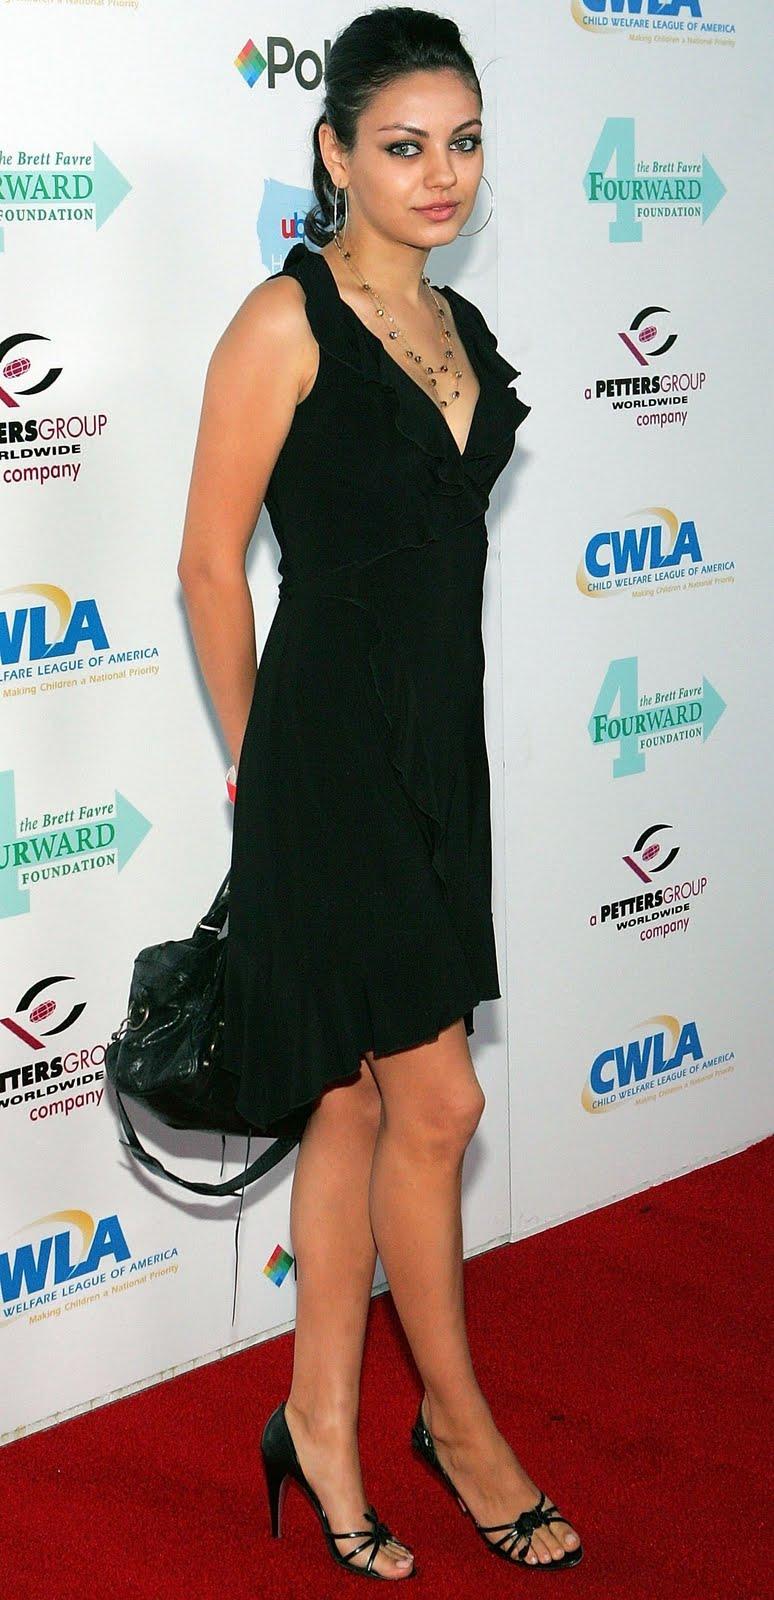 Mila Kunis Sexy Legs